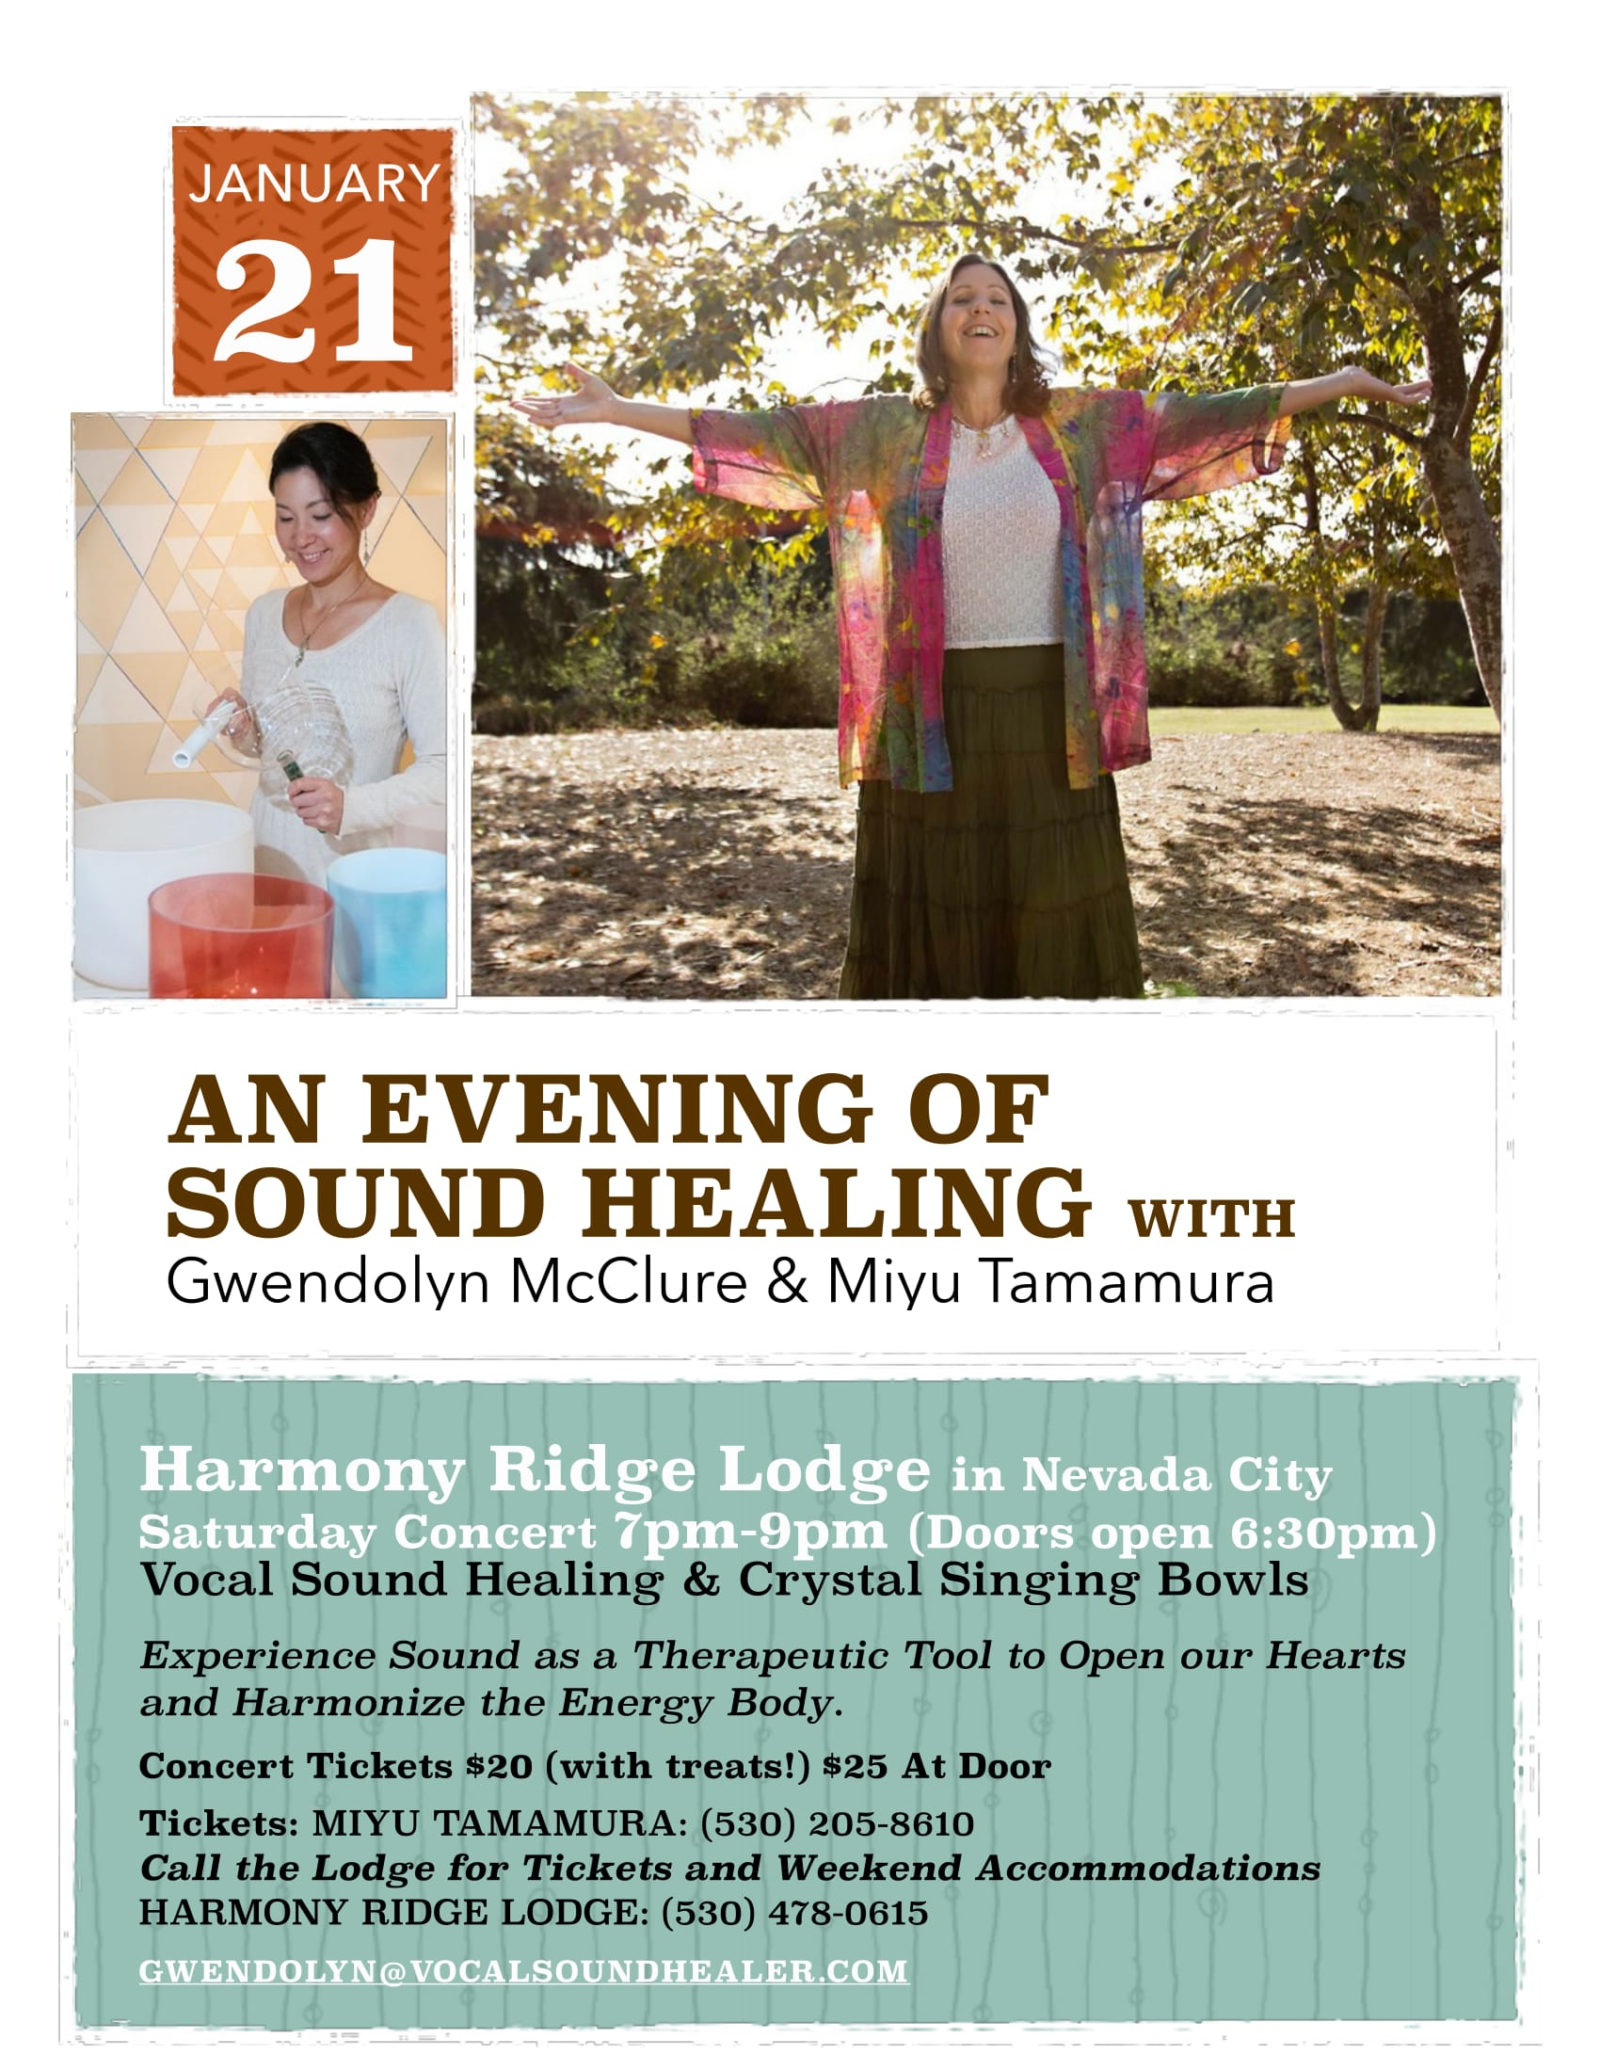 Sound Healing Concert January 21stFinal-JPG